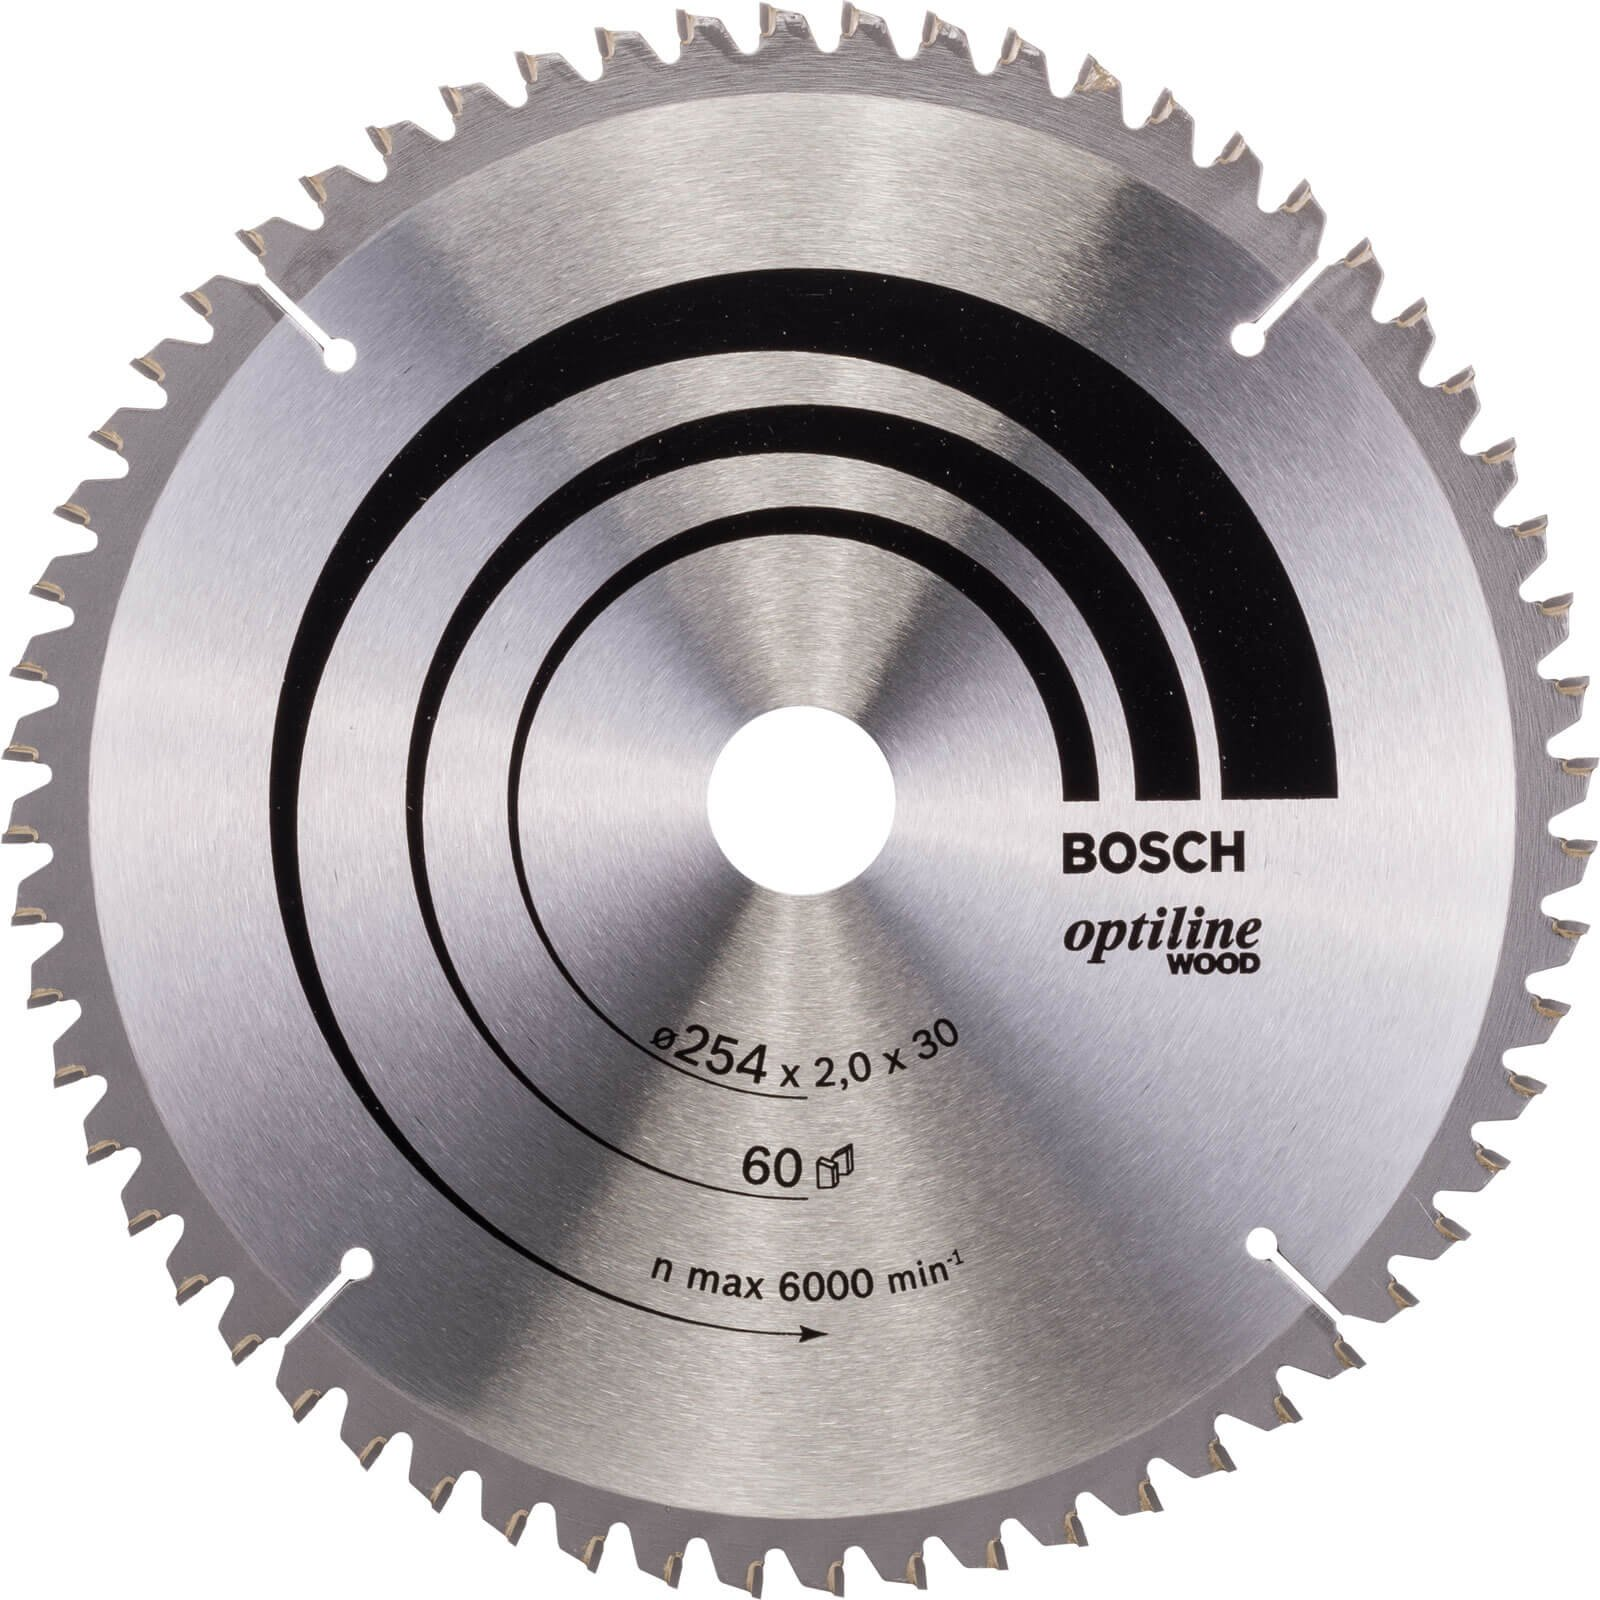 Bosch Optiline Wood Cutting Mitre Saw Blade 254mm 60T 30mm